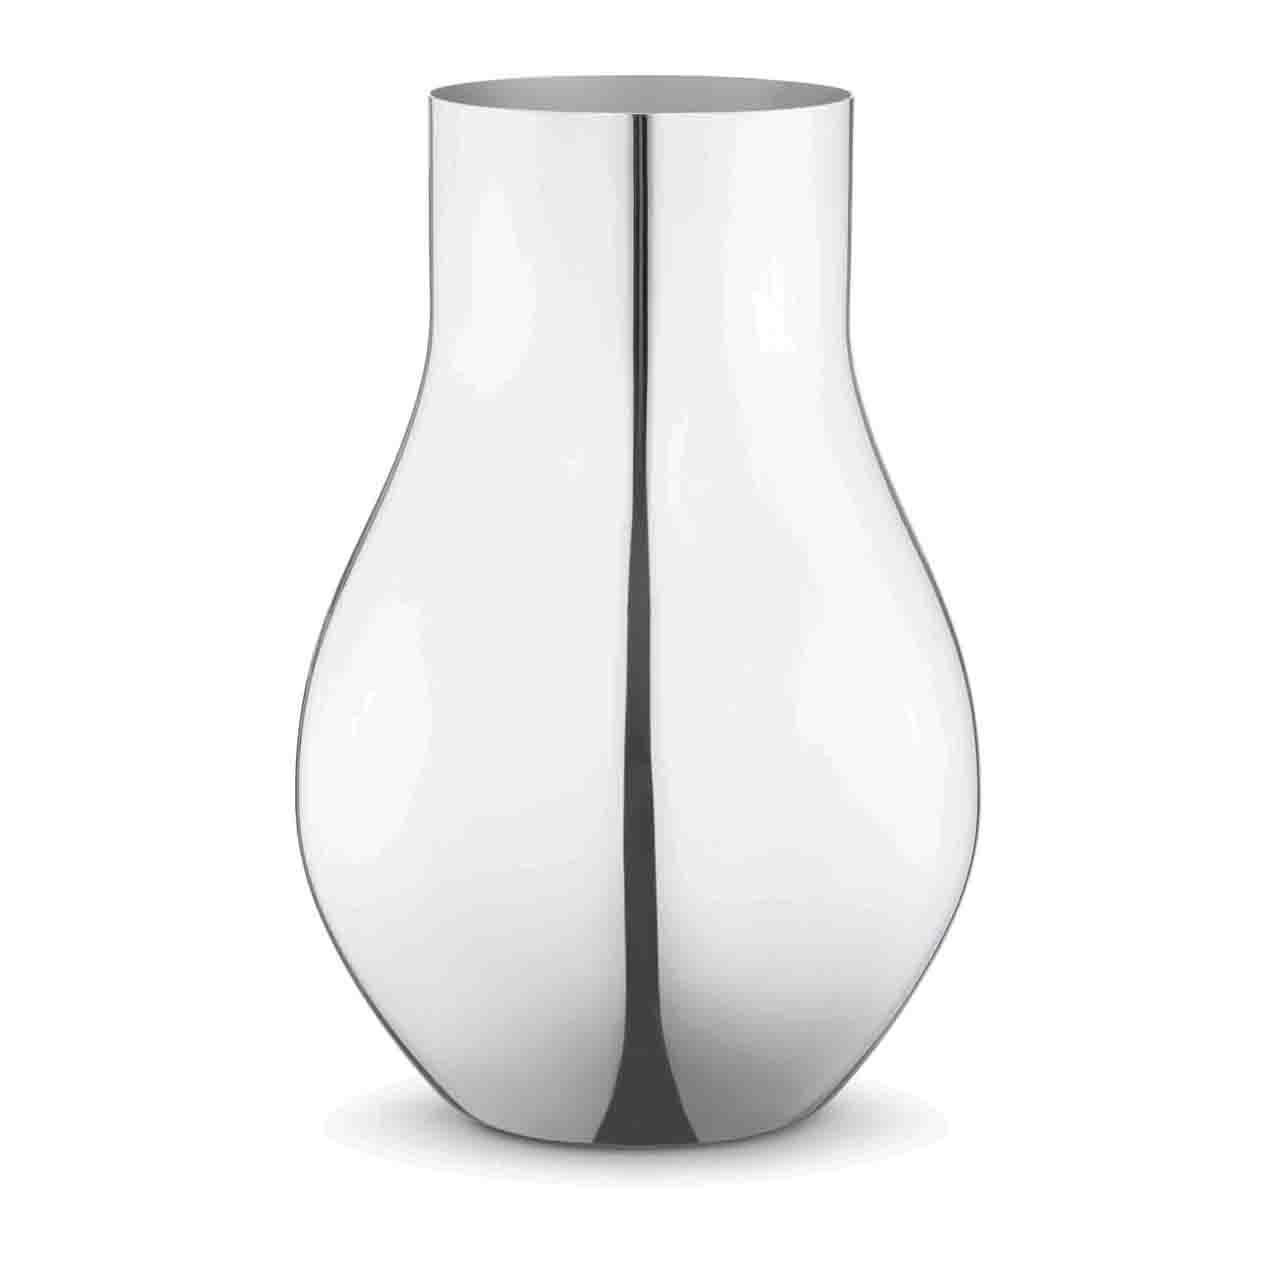 LIVING GEORG JENSEN CAFU系列 - 不鏽鋼花器(大型) 建議售價NT$6,900